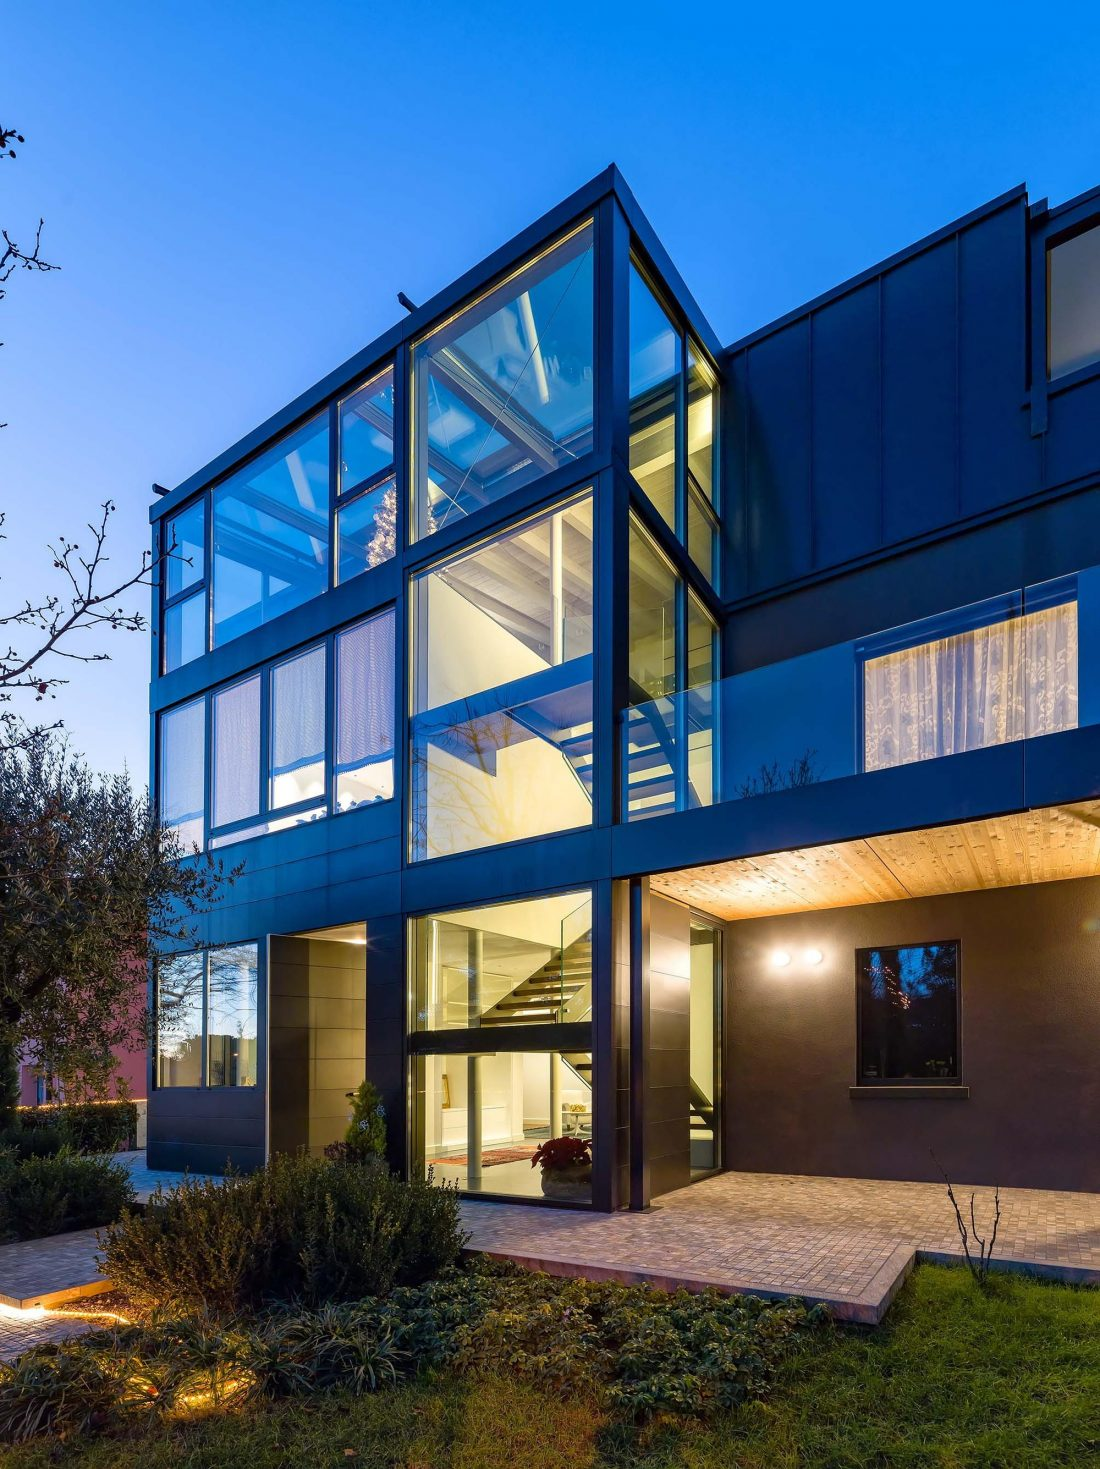 Дом в Порденоне, Италия, от студии Caprioglio Associati Architects 6